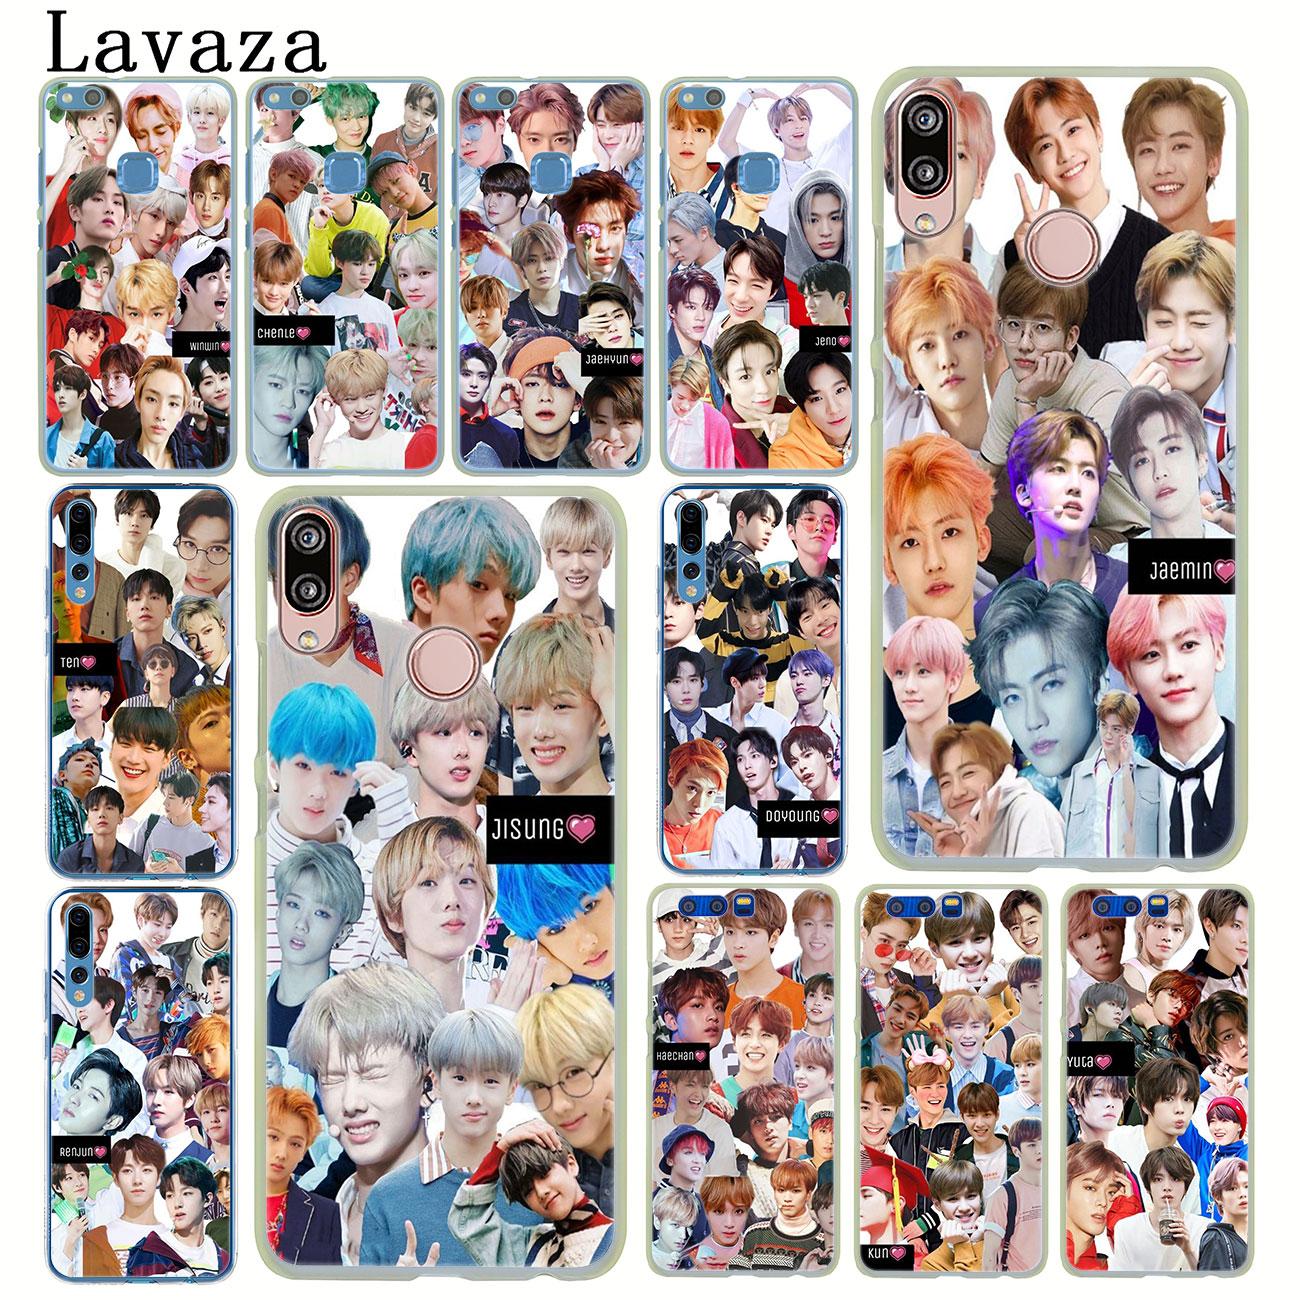 Caixa Do Telefone para Huawei P30 Lavaza NCT 127 KPOP P20 P10 P9 Plus P8 Lite Mini 2017 2016 P inteligente Z 2019